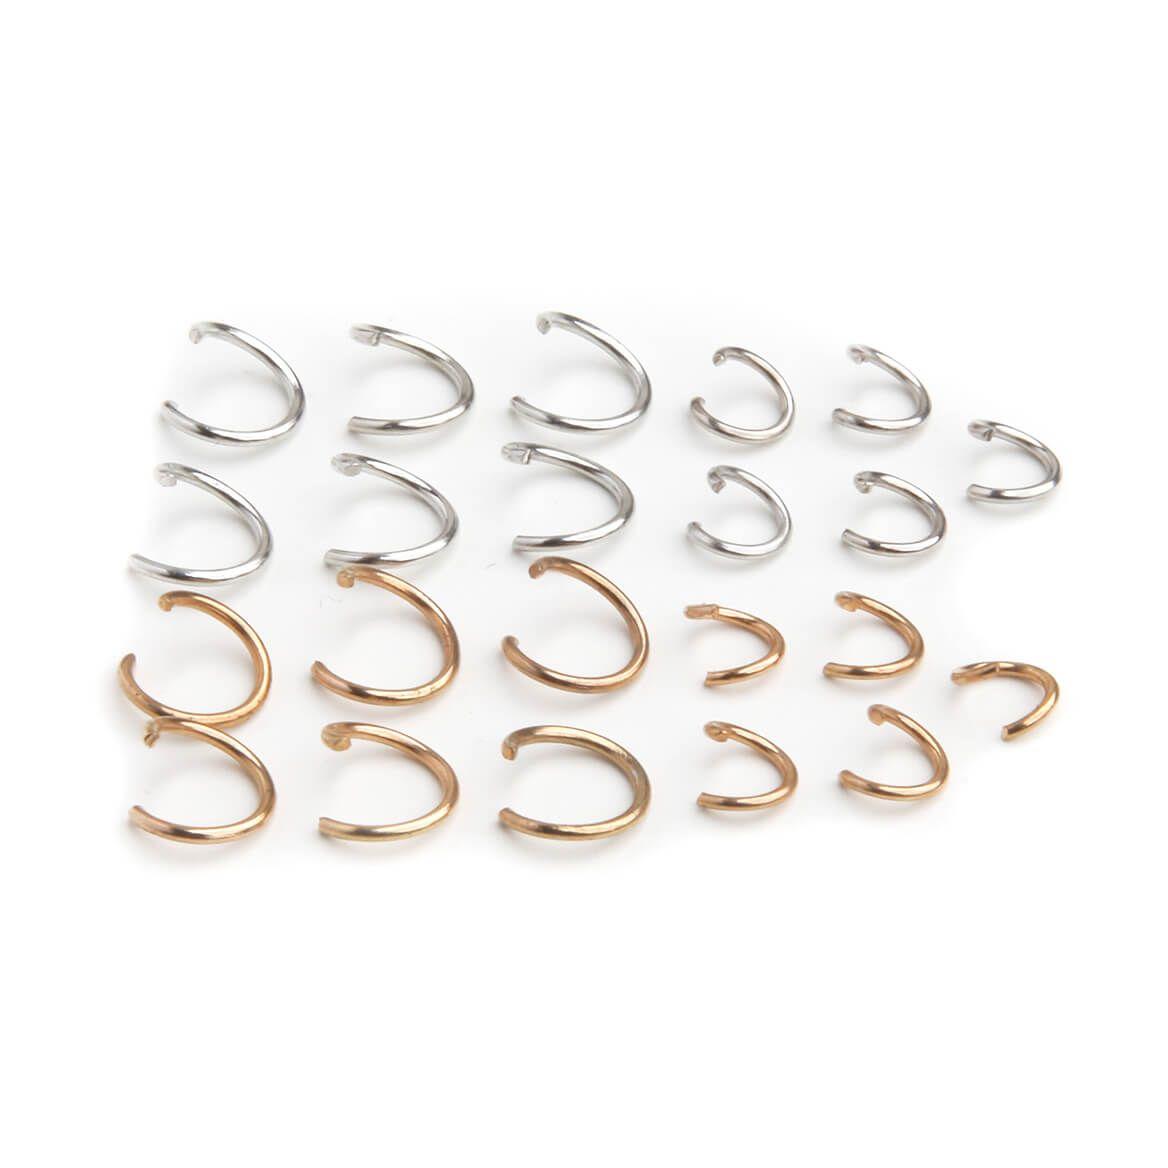 Jewelry Repair Kit-367131